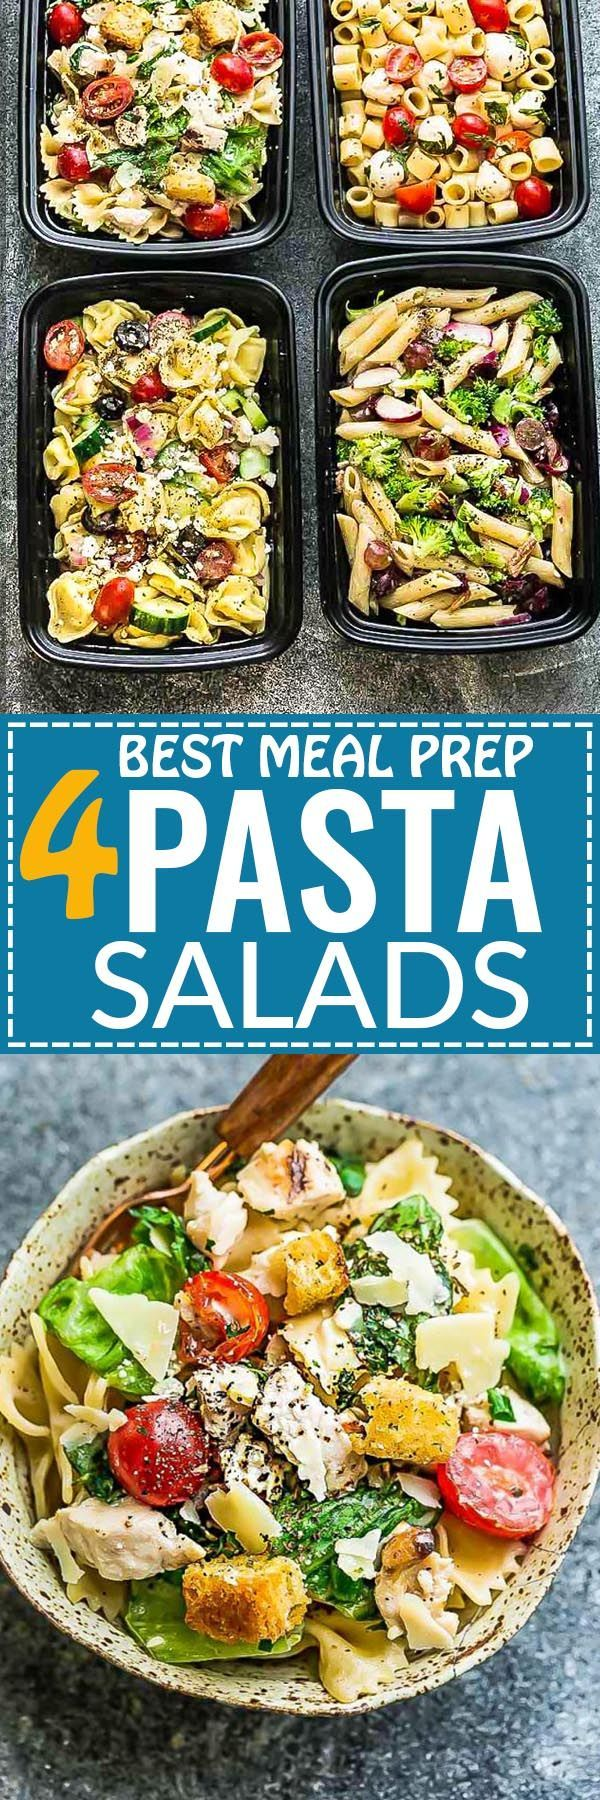 331 best Recipes | Meal Prep images on Pinterest | 1st grades ...